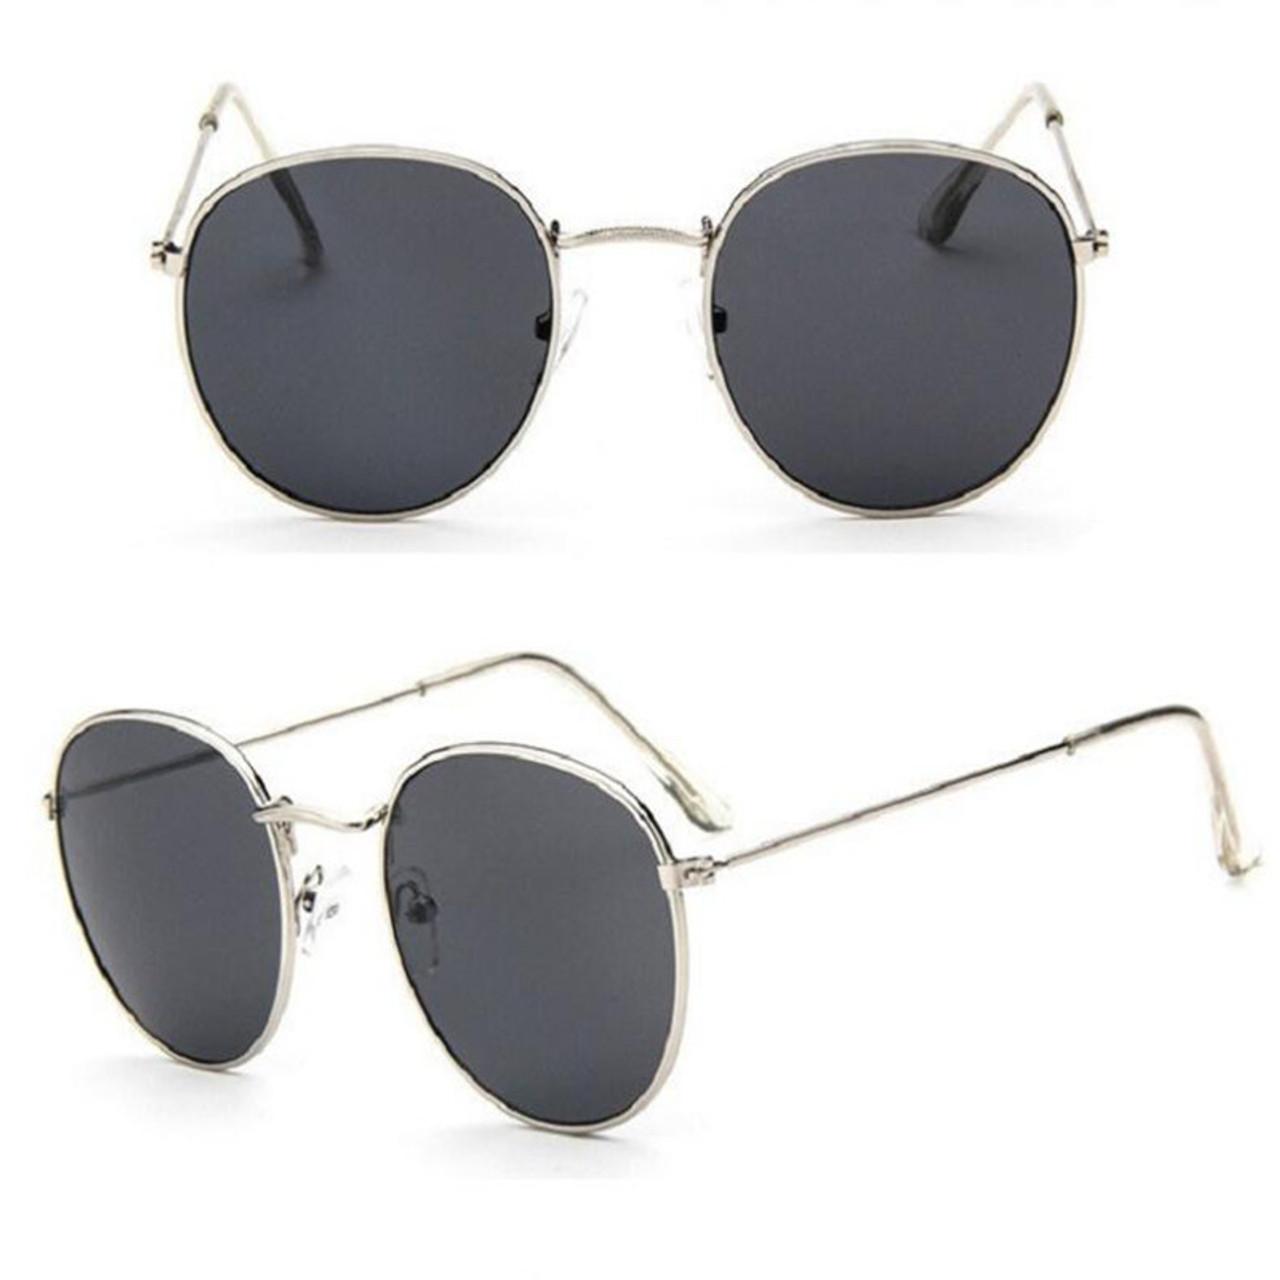 eb61201dd9 ... Luxury Brand Design Round Sunglasses Women Men Brand Designer Vintage  Retro Mirror Sun Glasses For Women